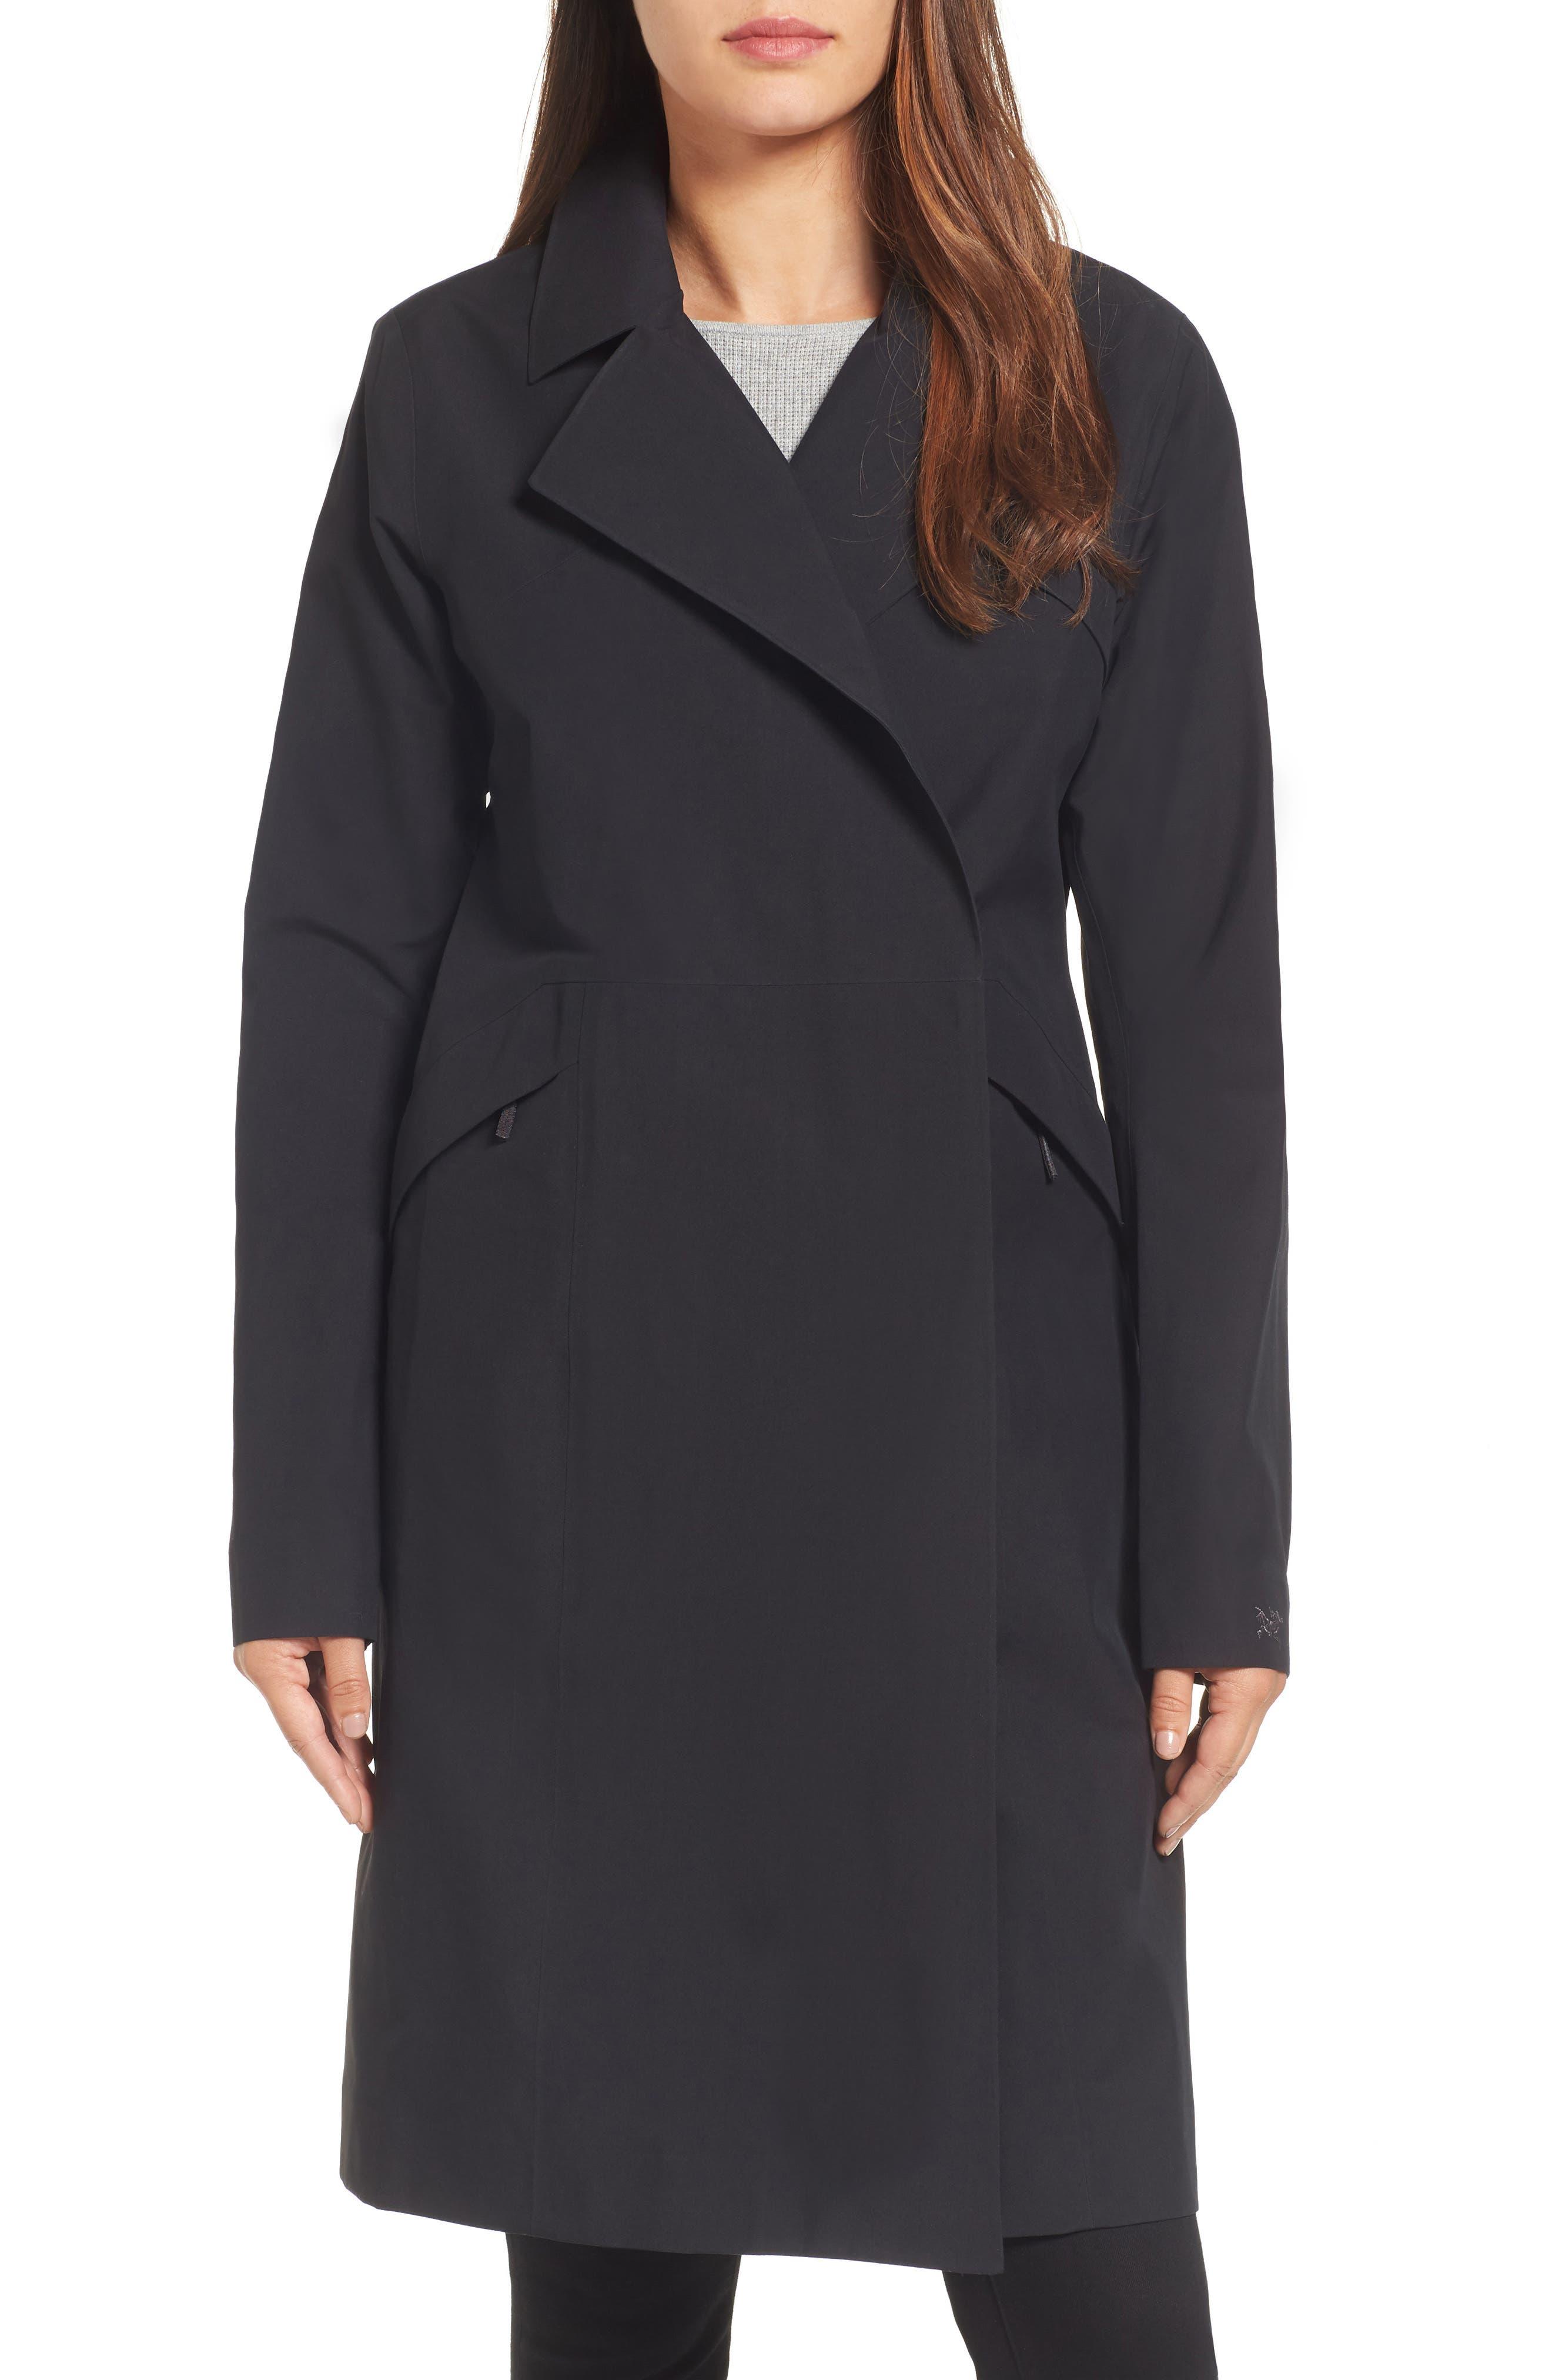 Nila Gore-Tex<sup>®</sup> Trench Coat,                             Main thumbnail 1, color,